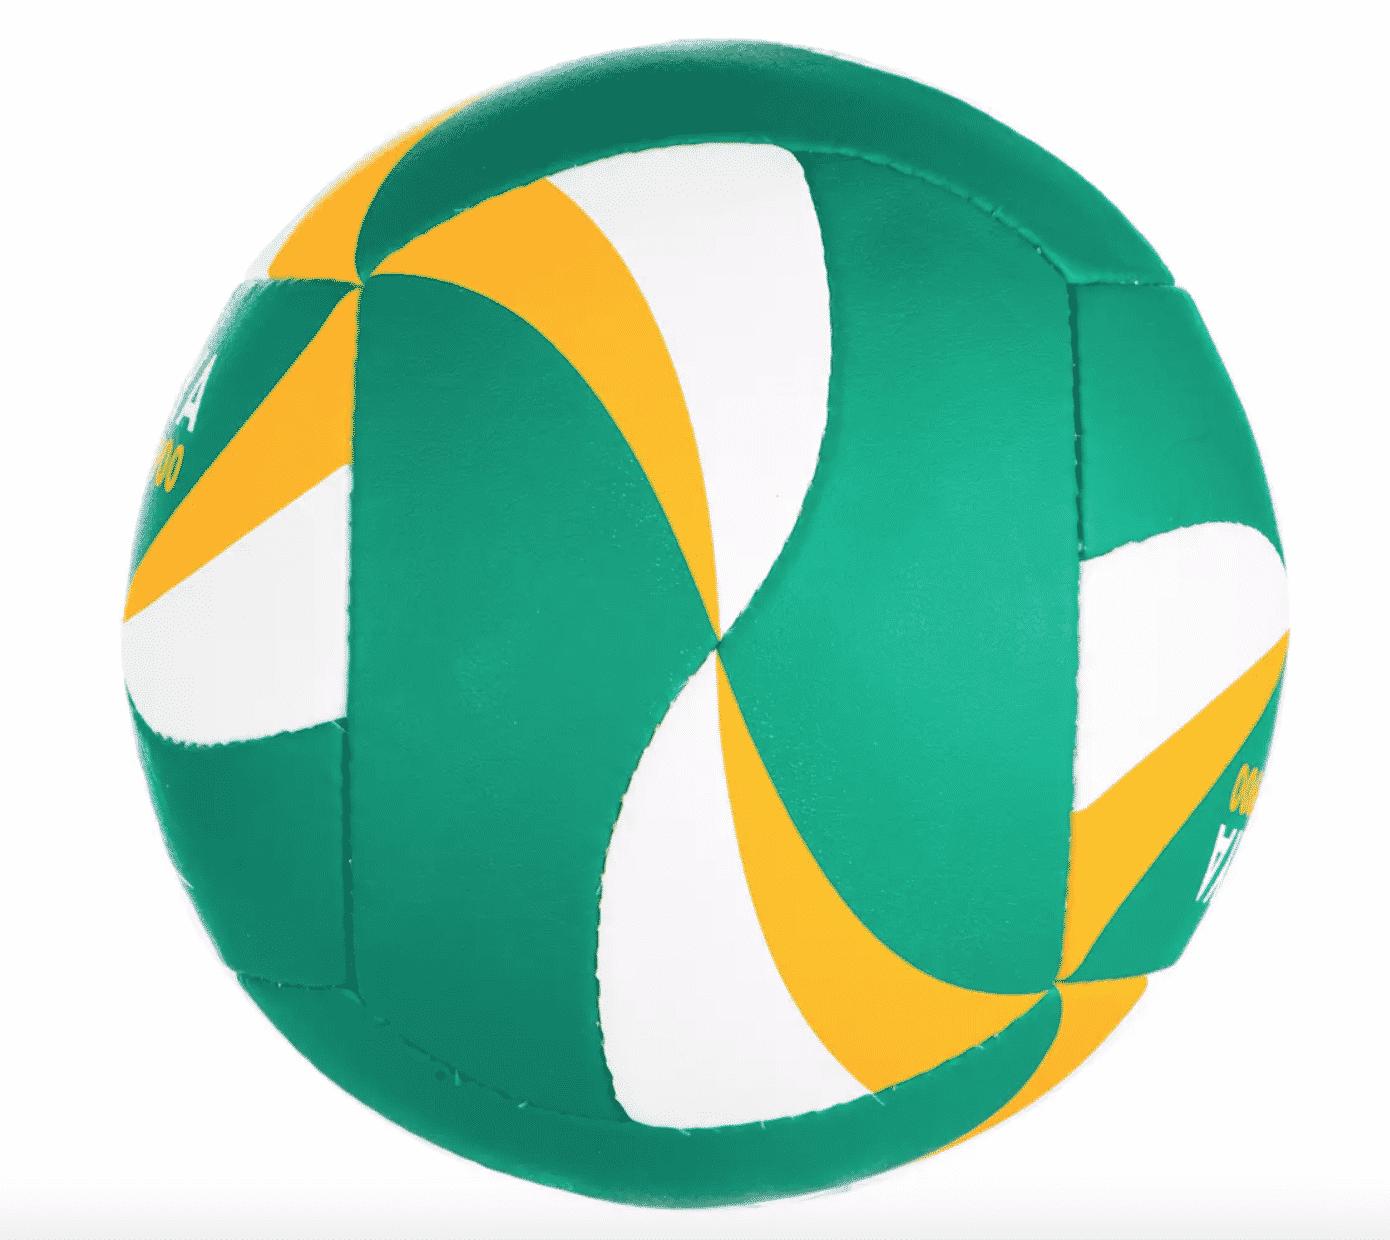 copaya-bv900-ballon-beach-volley-vert-jaune-2020-6